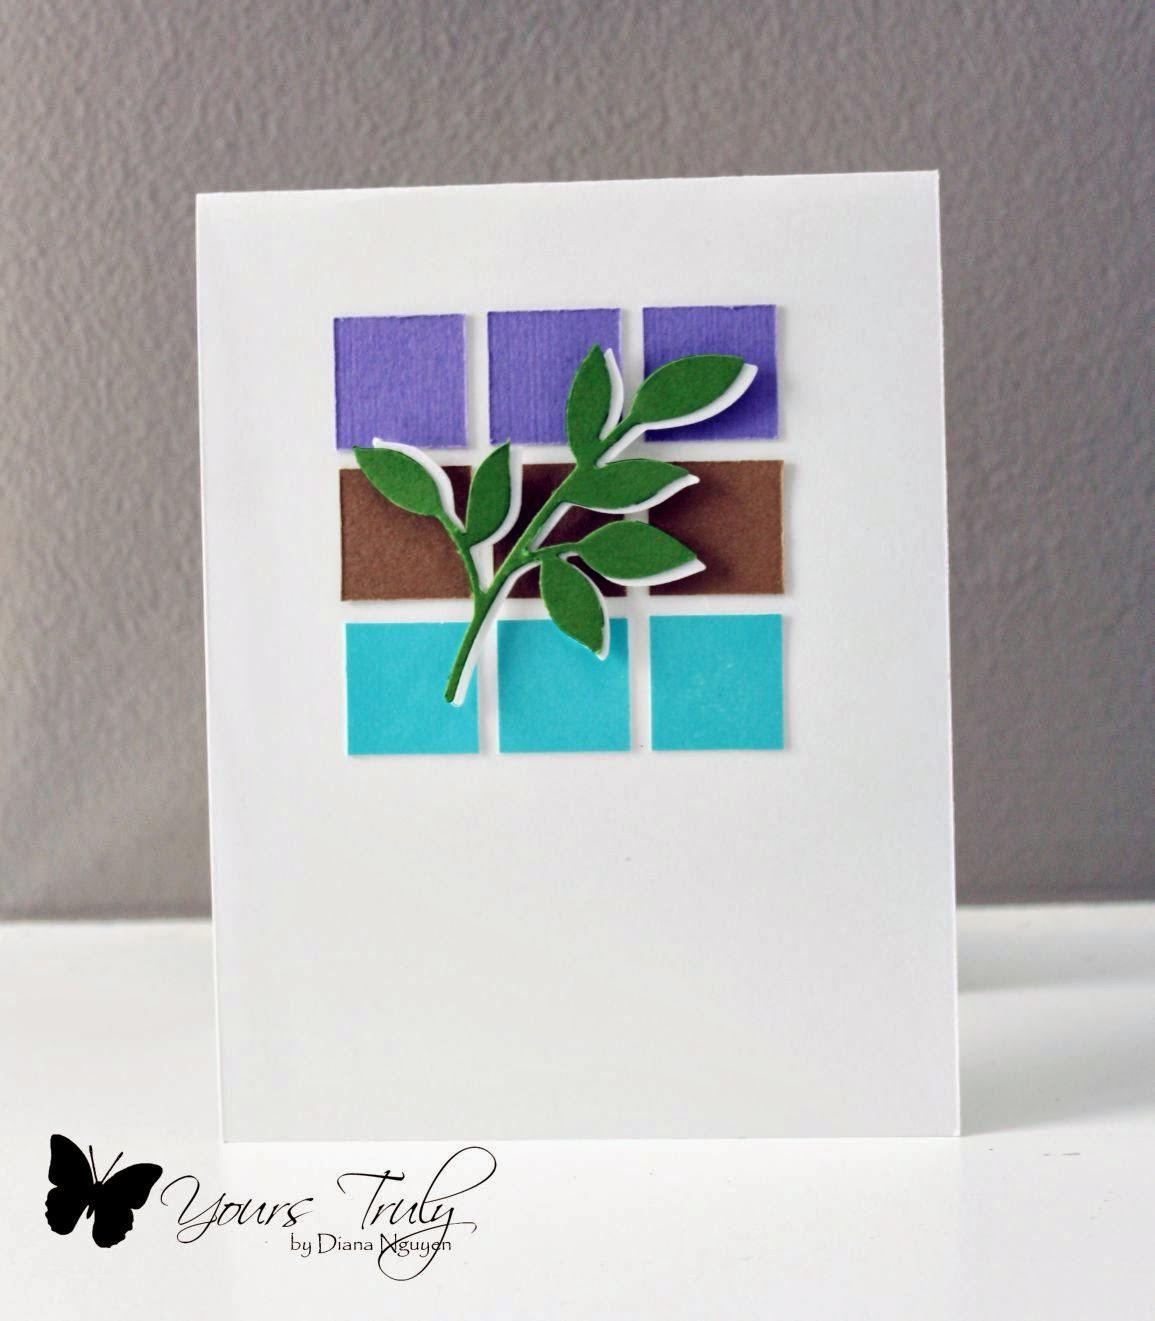 Diana Nguyen, color blocking, card